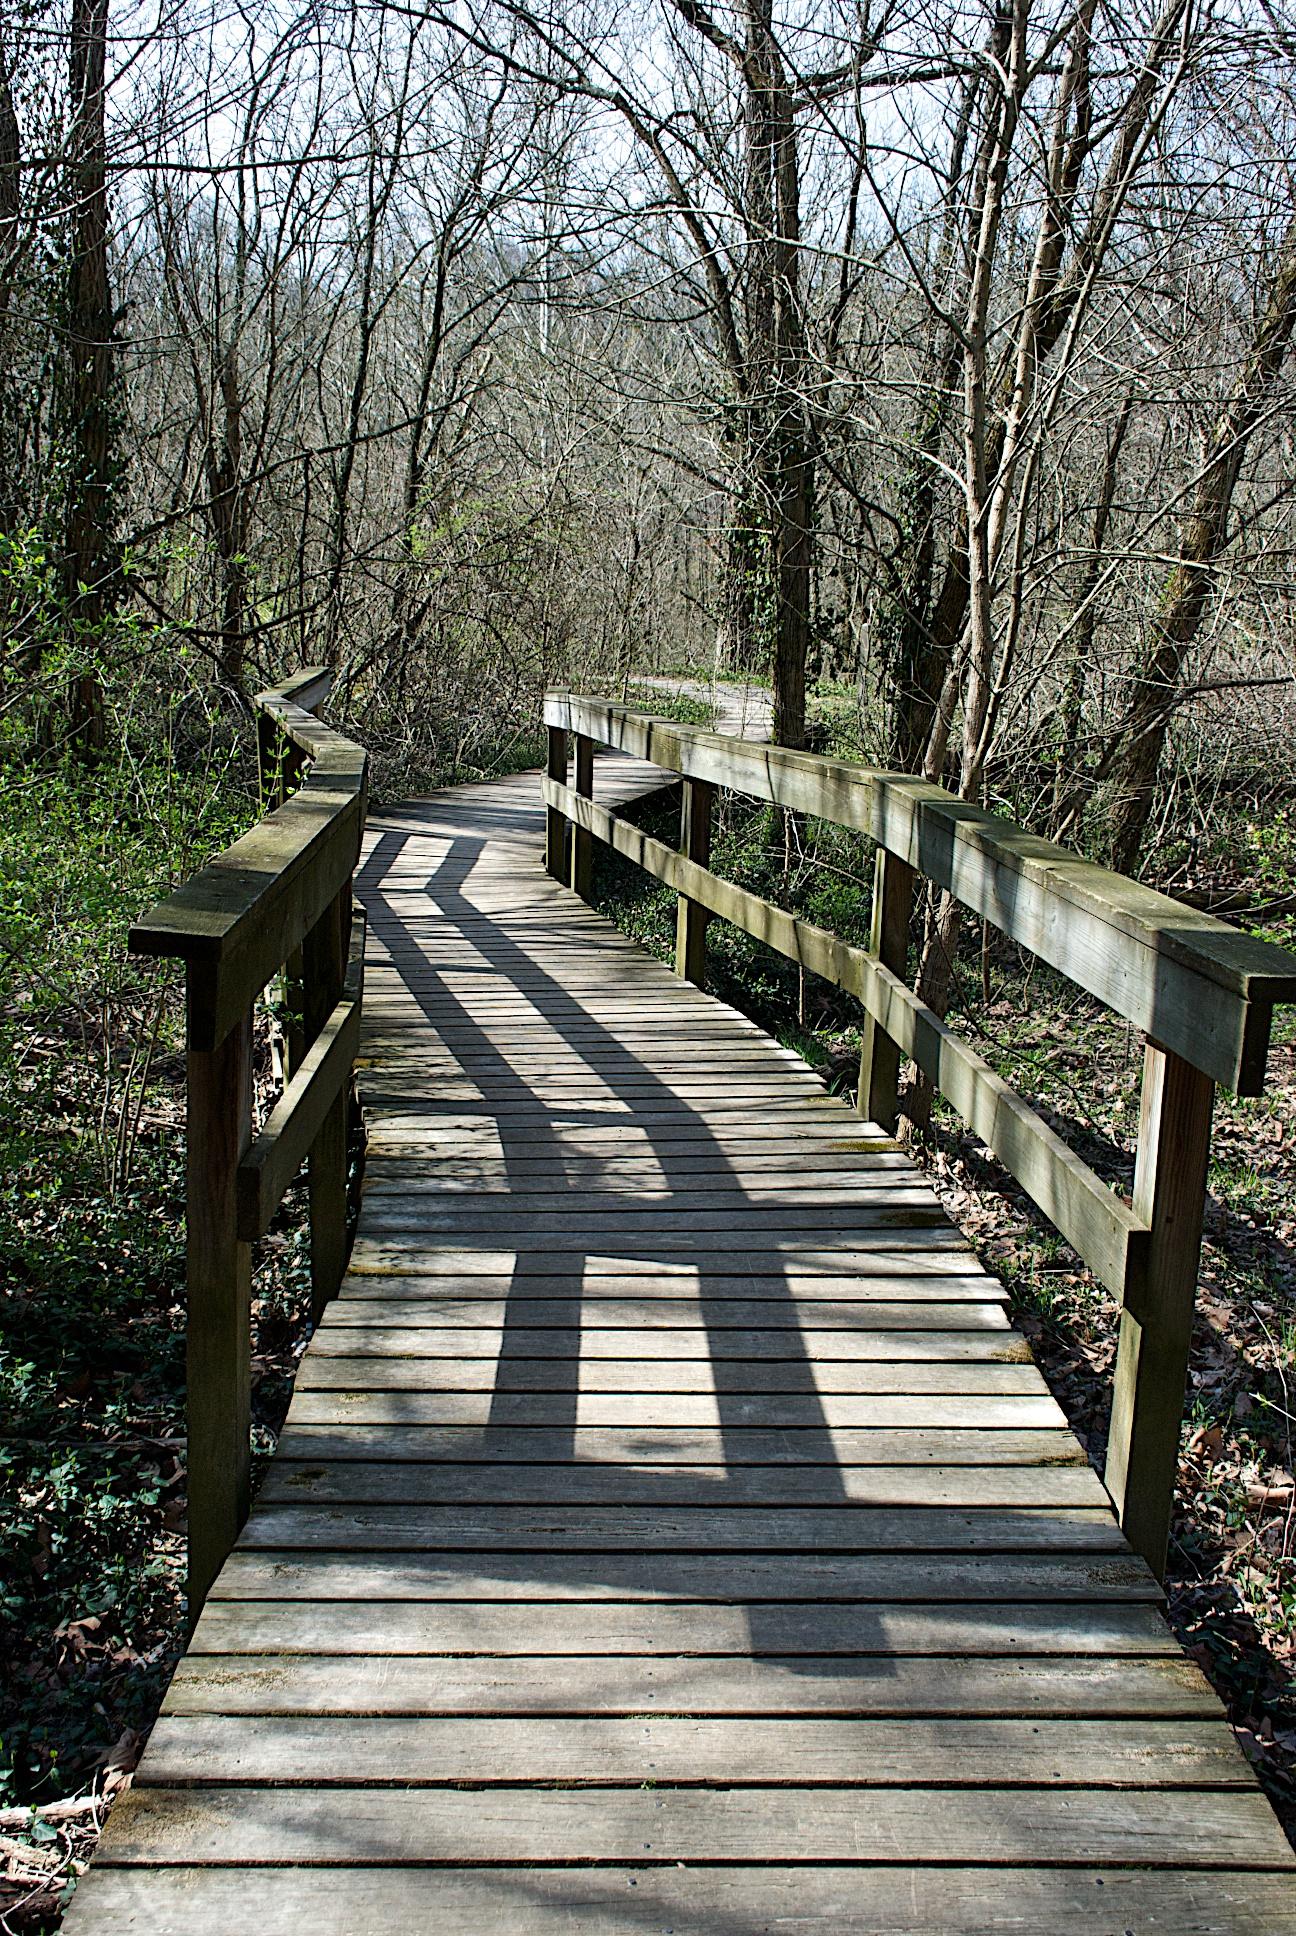 Winton Woods Kingfisher Trail